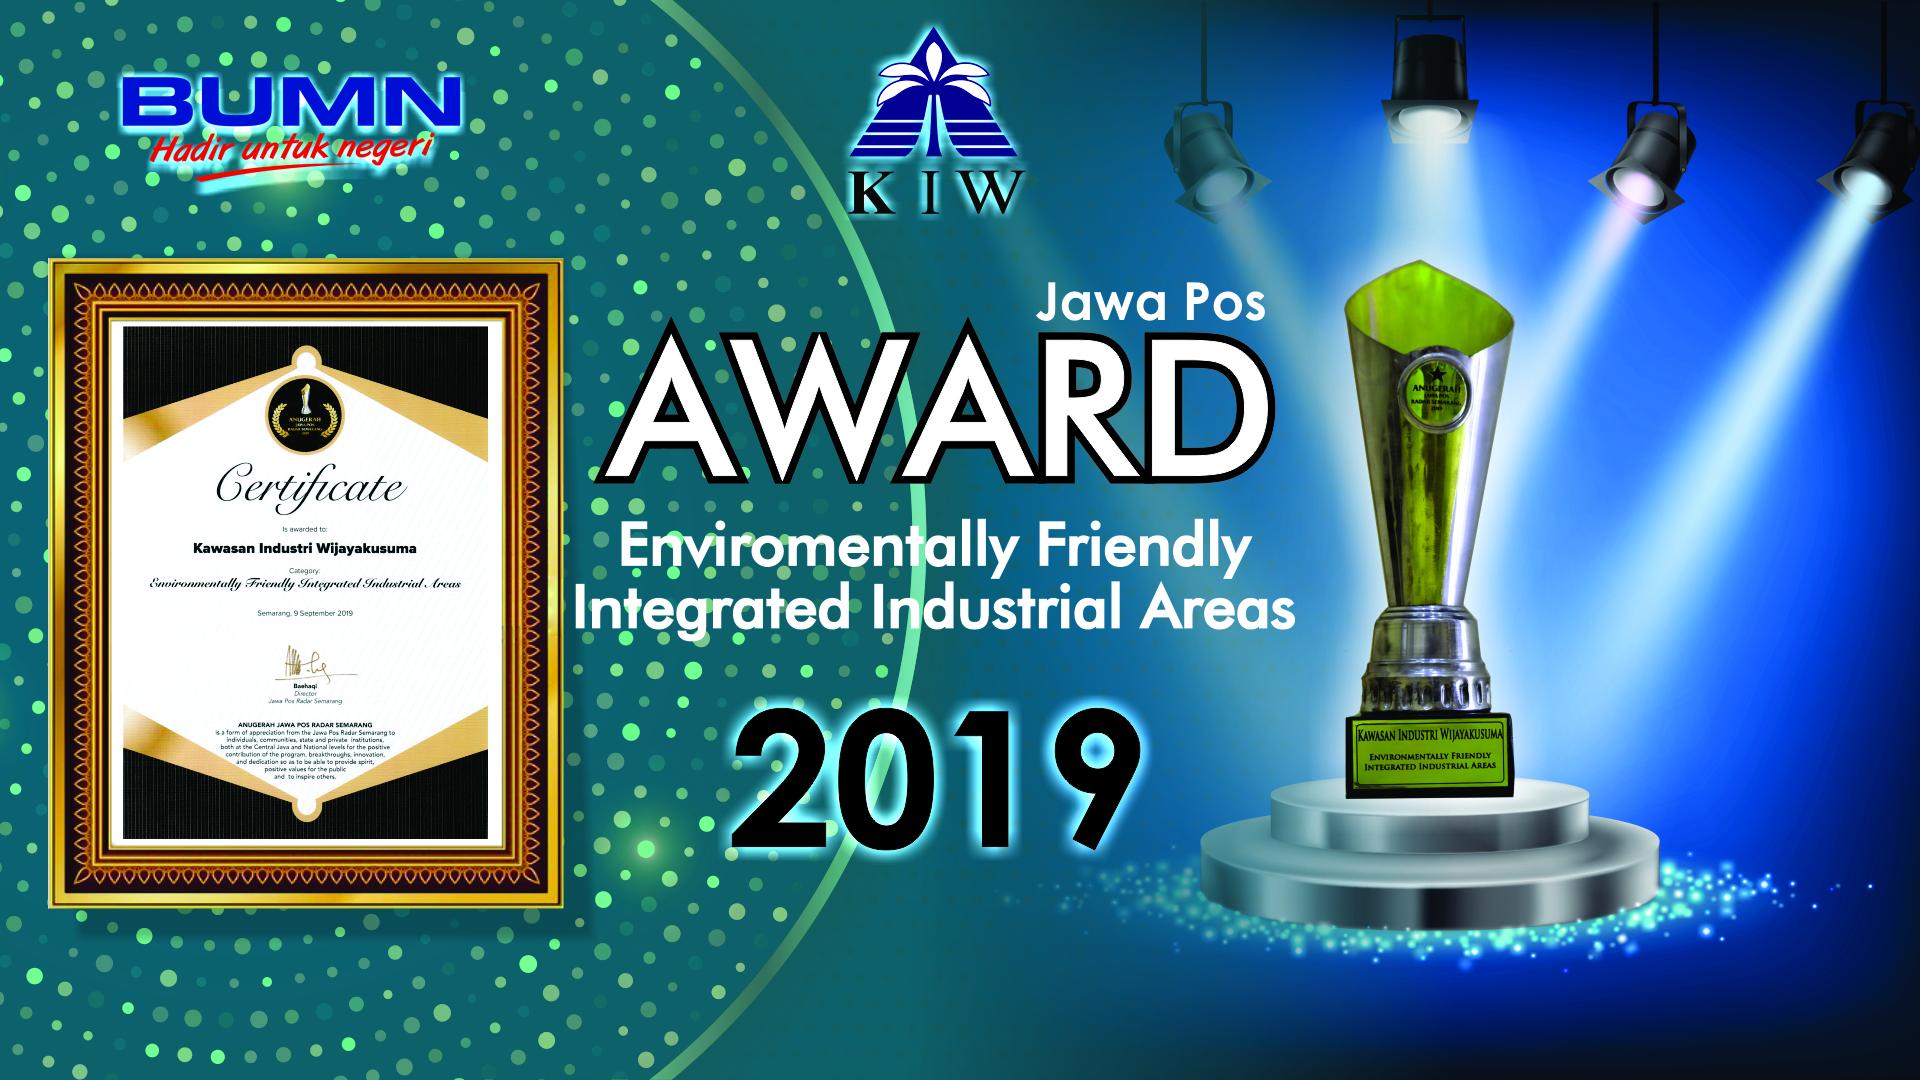 KIW Jawa Pos Award 2019